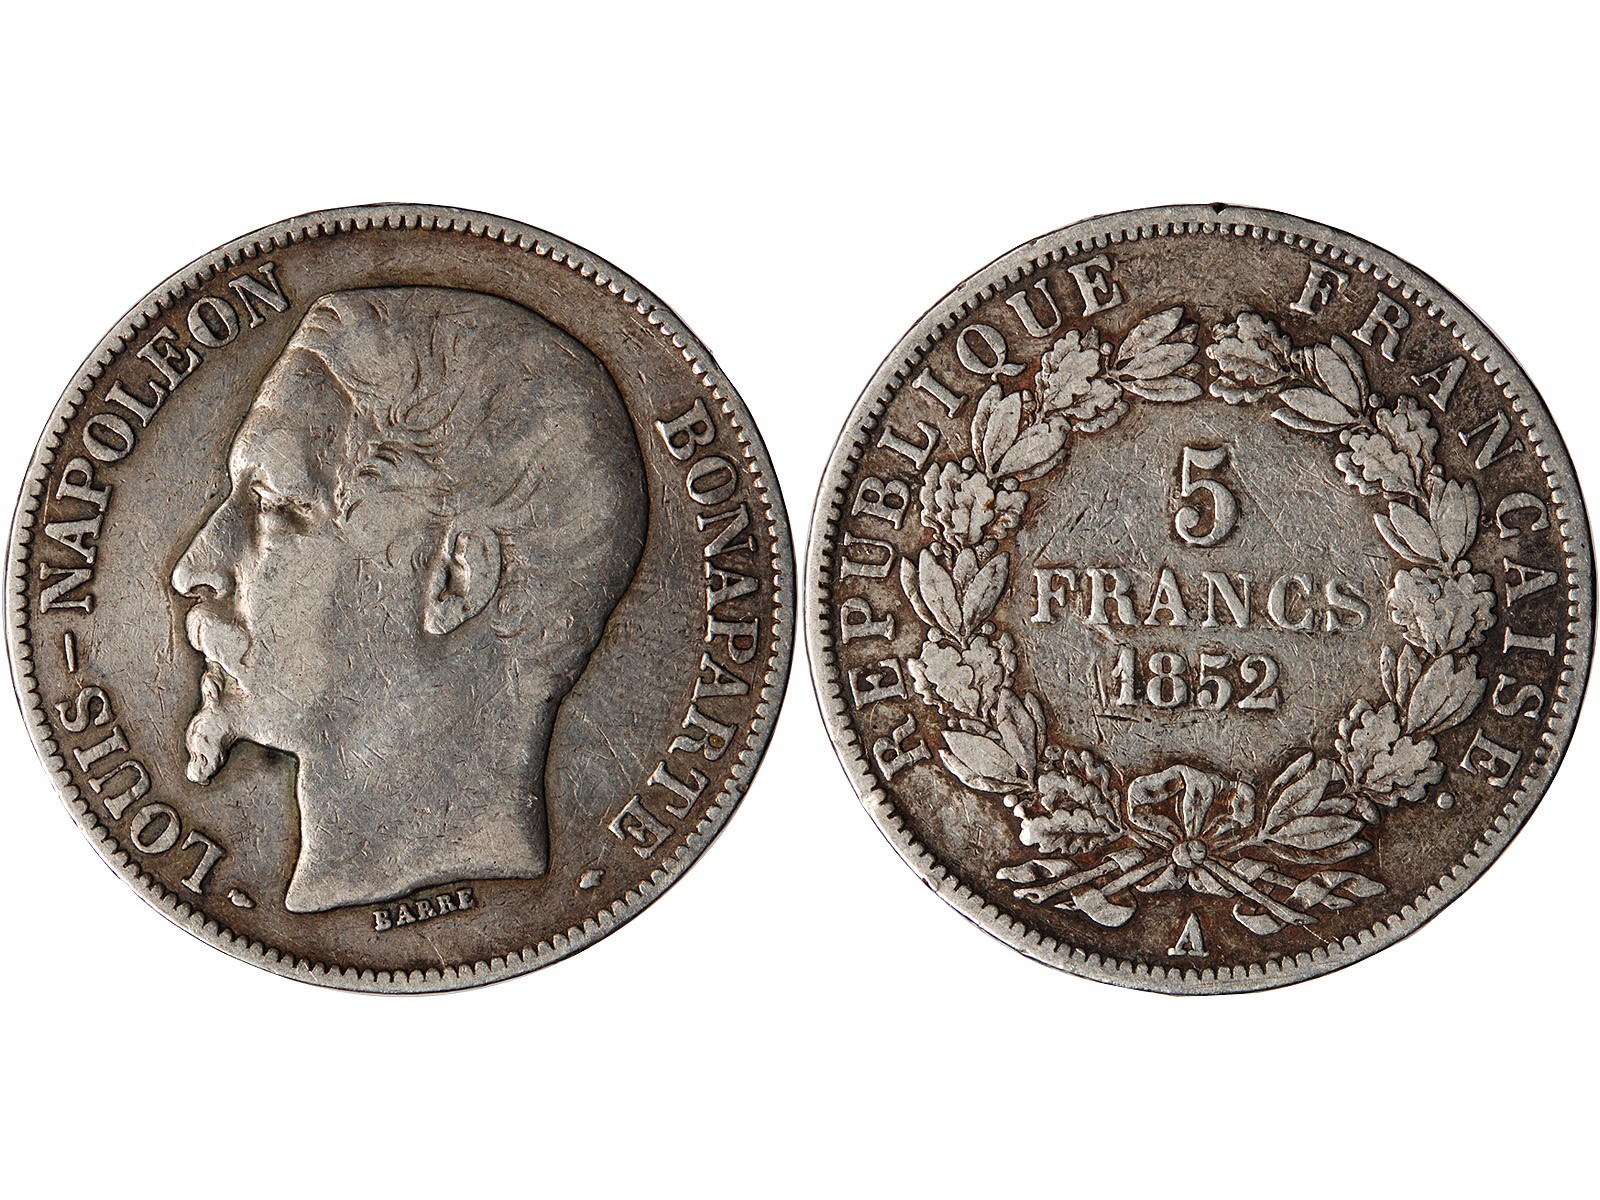 louis napoleon bonaparte Napoleon iii, louis-napoléon bonaparte (20 april 1808 – 9 january 1873) was the only president (1848–52) of the french second republic and, as napoleon iii, the emperor (1852–70) of the.